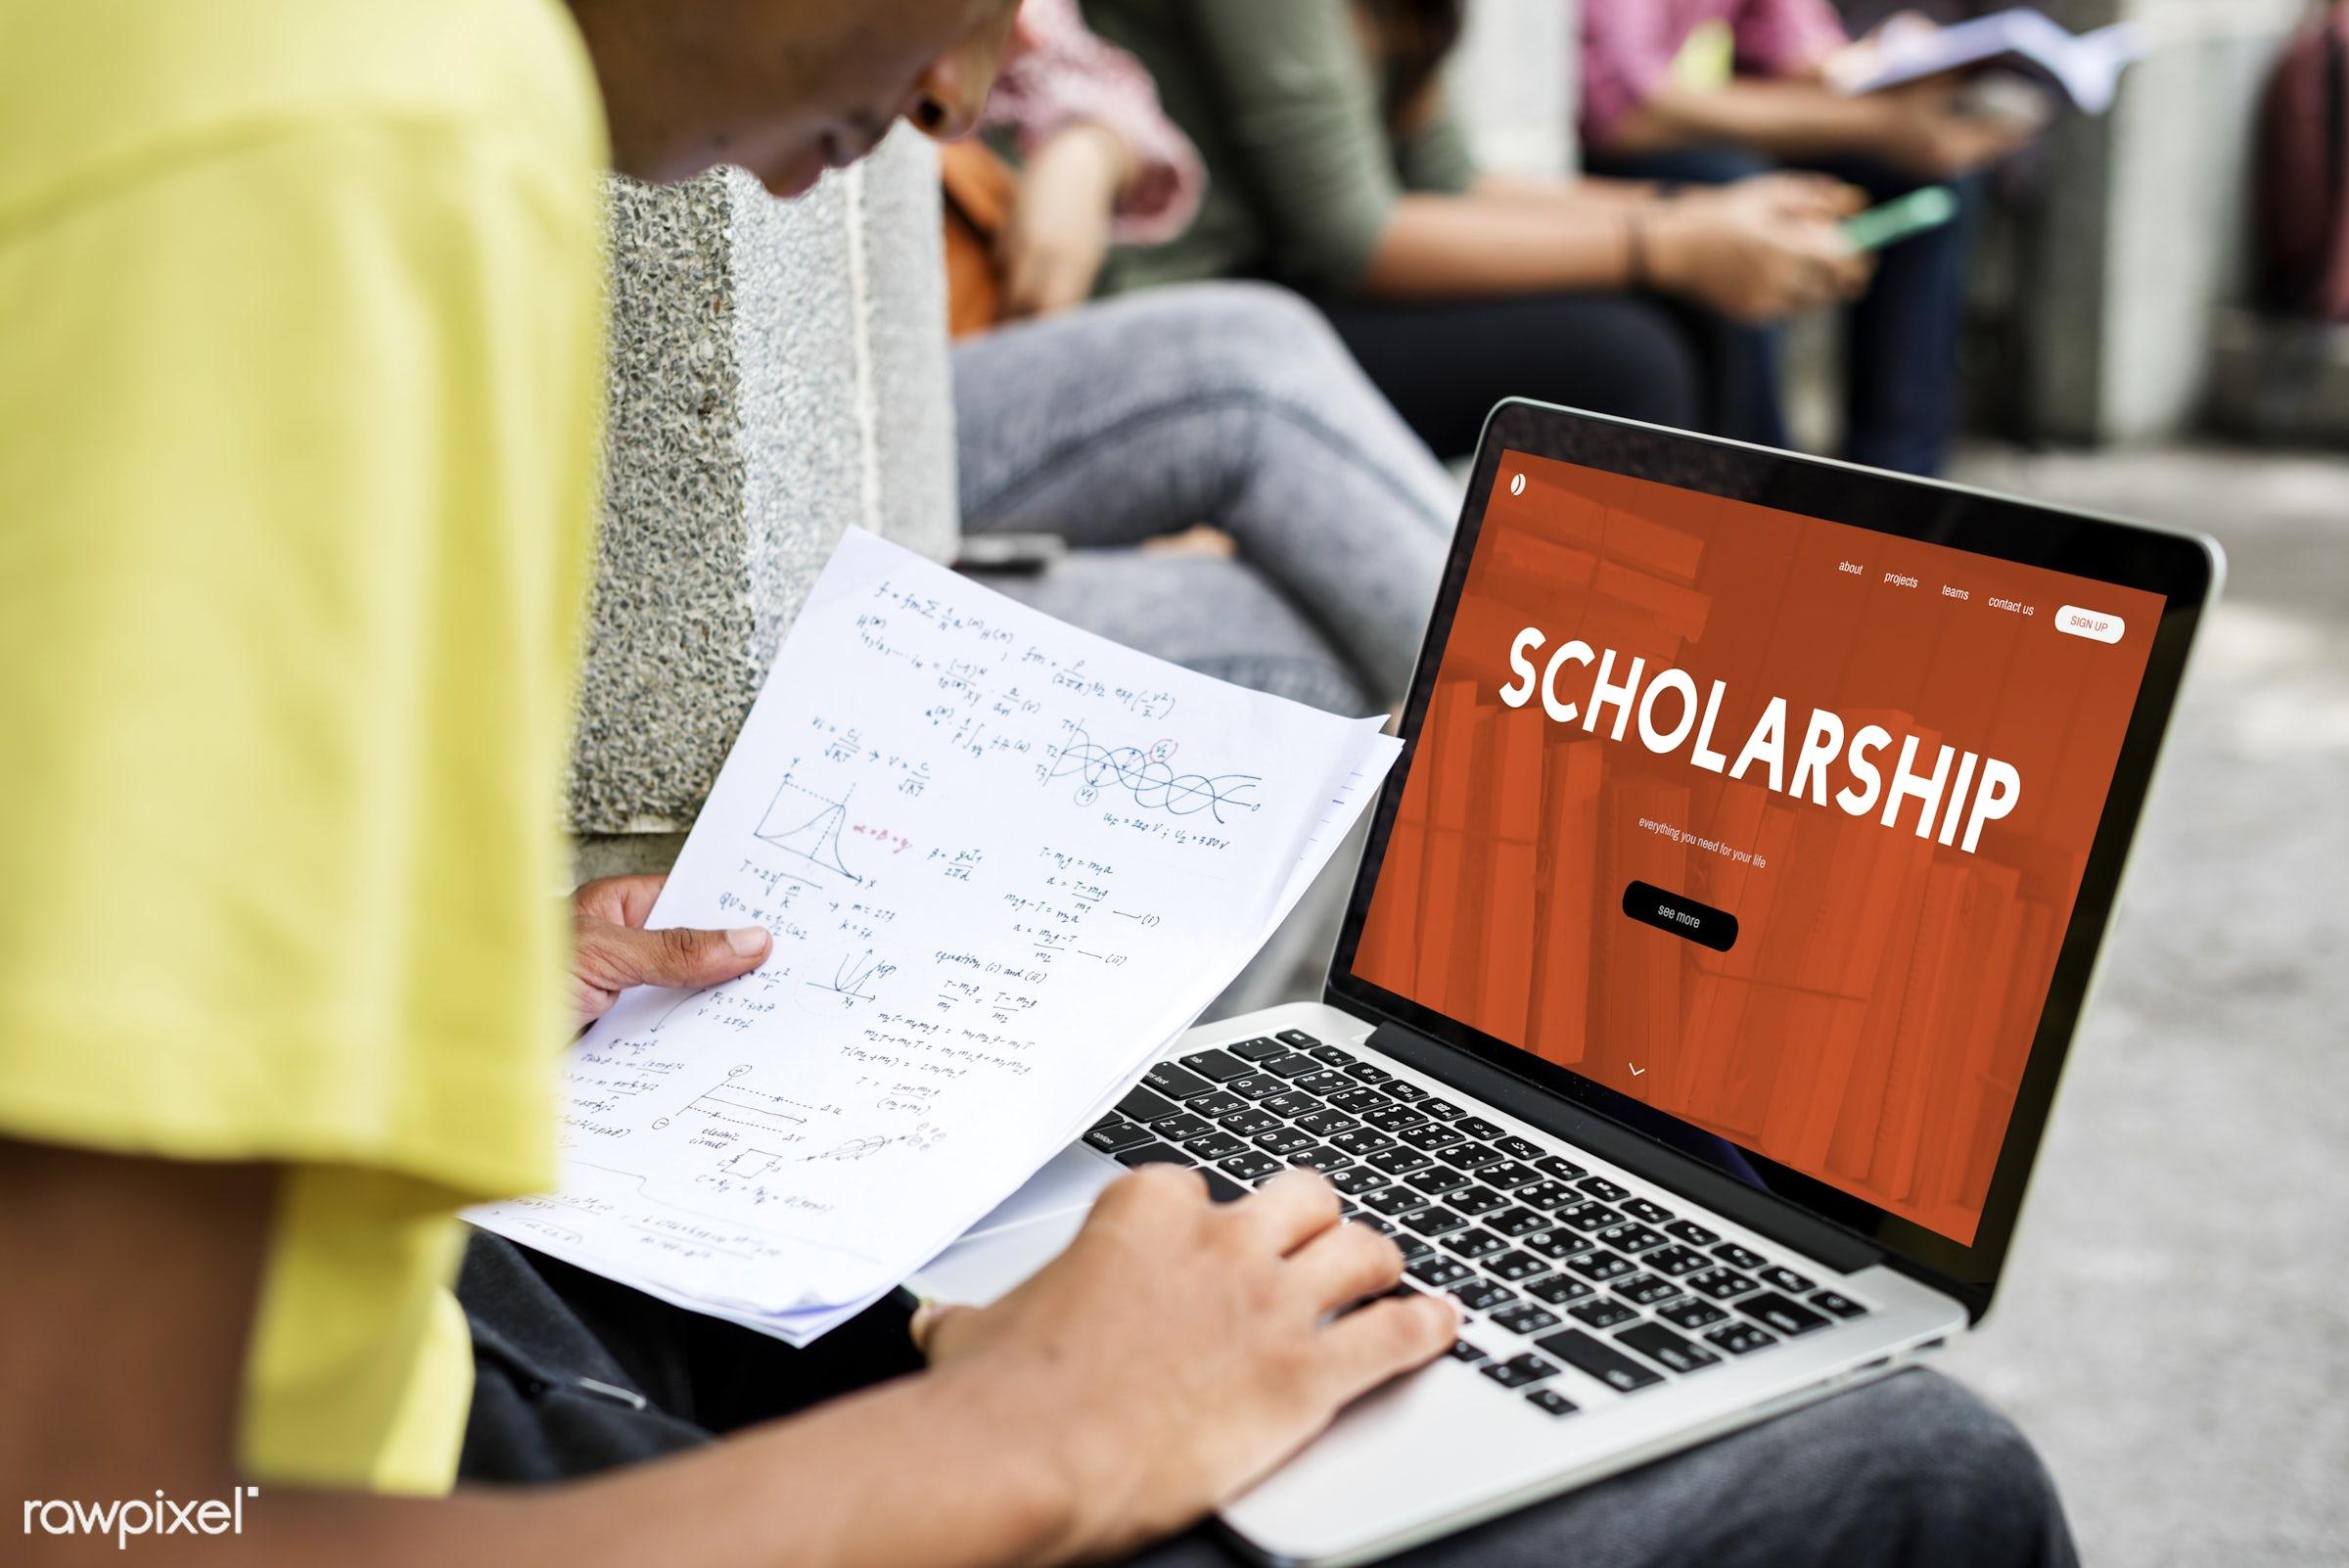 Online scholarship - academics, boy, calculation, case, class, course, curriculum, digital device, distance, e-learning,...